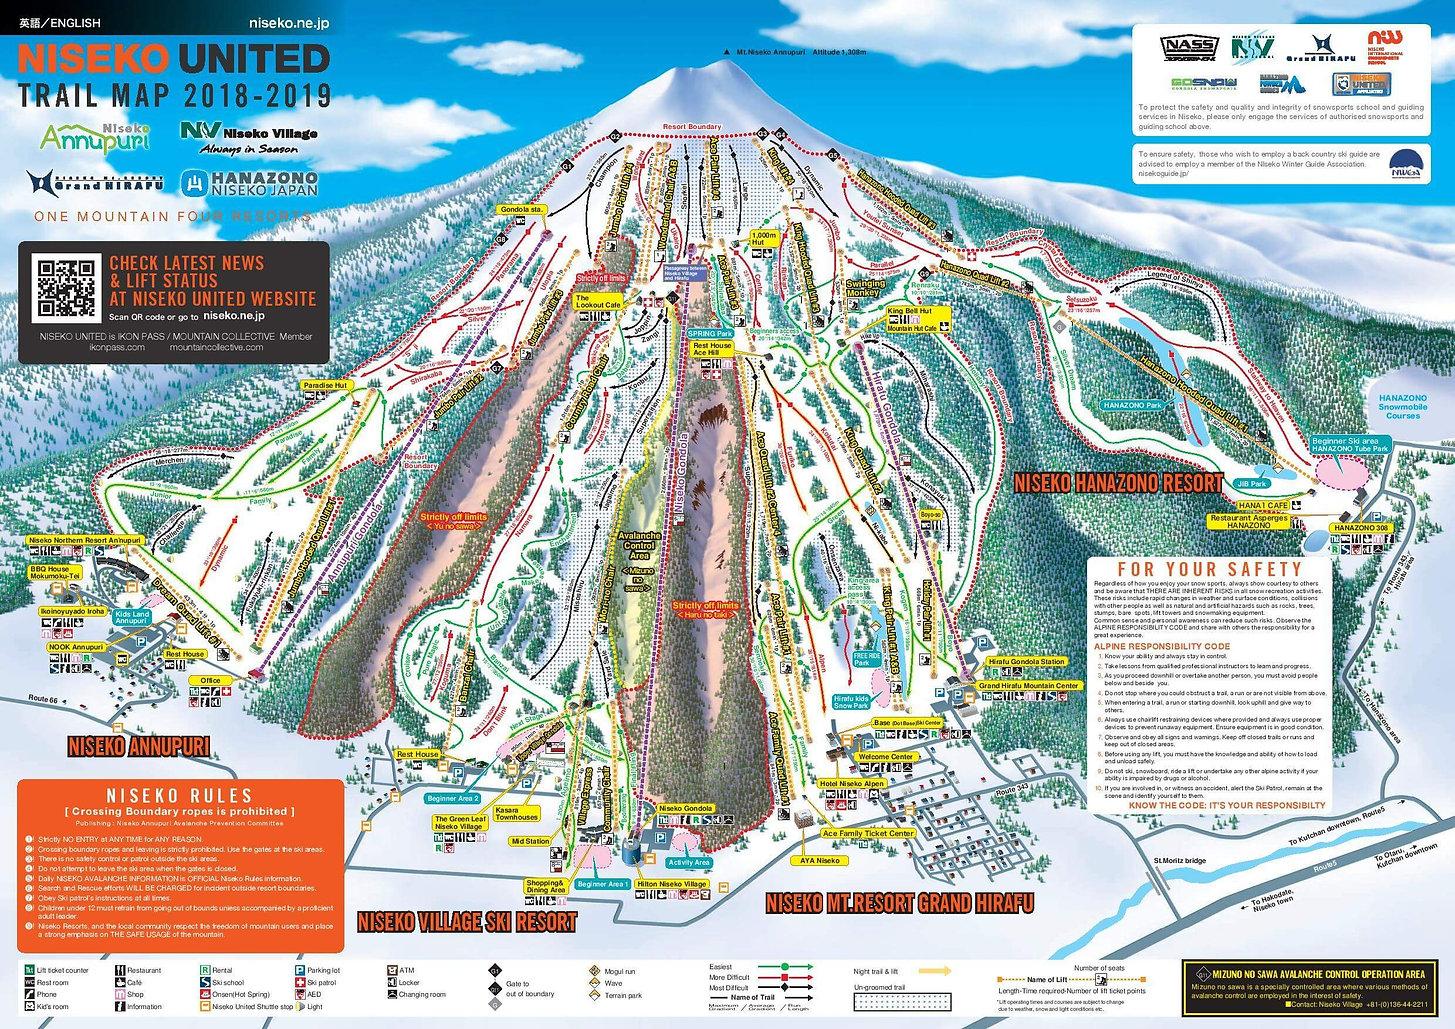 Niseko-piste-map-2021-official